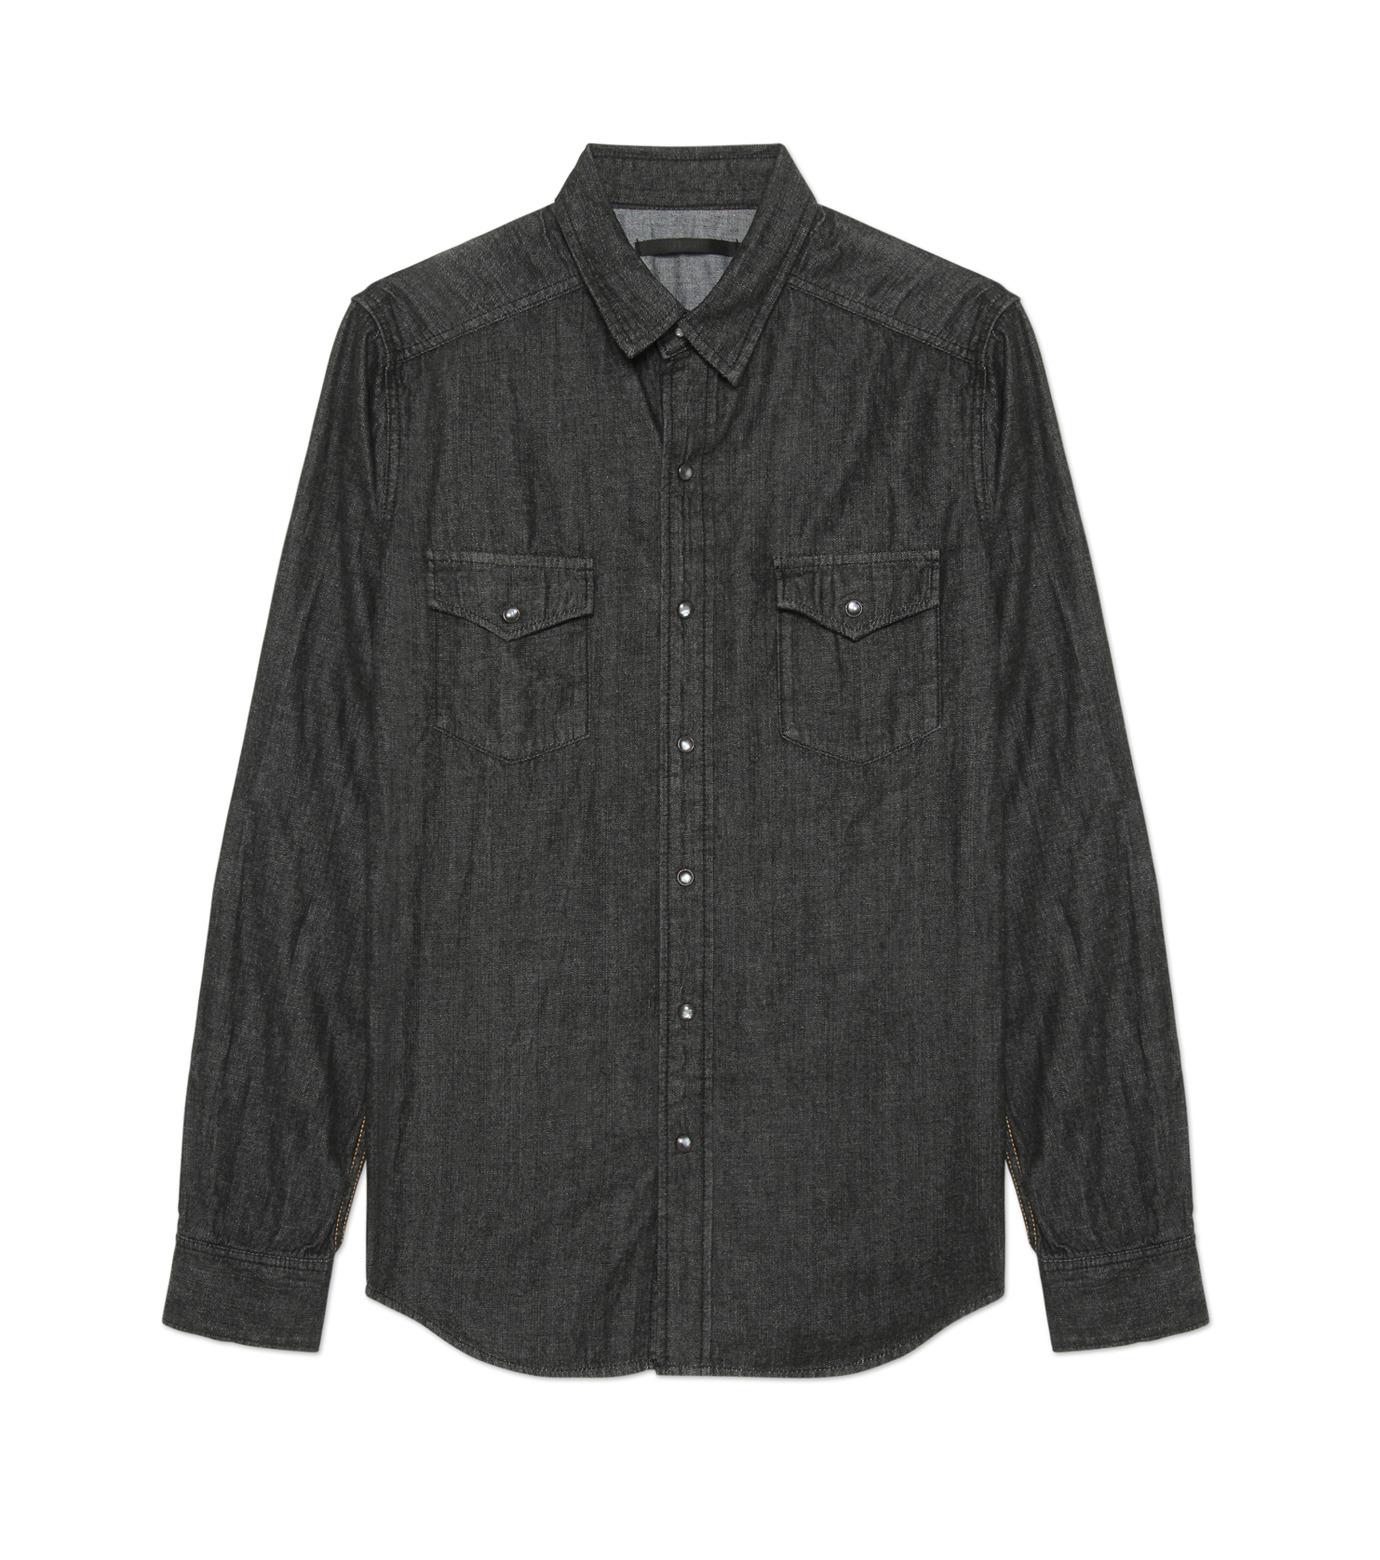 HL HEDDIE LOVU(エイチエル・エディールーヴ)のHL DENIM SHIRT-BLACK(シャツ/shirt)-17A93003-13 拡大詳細画像1